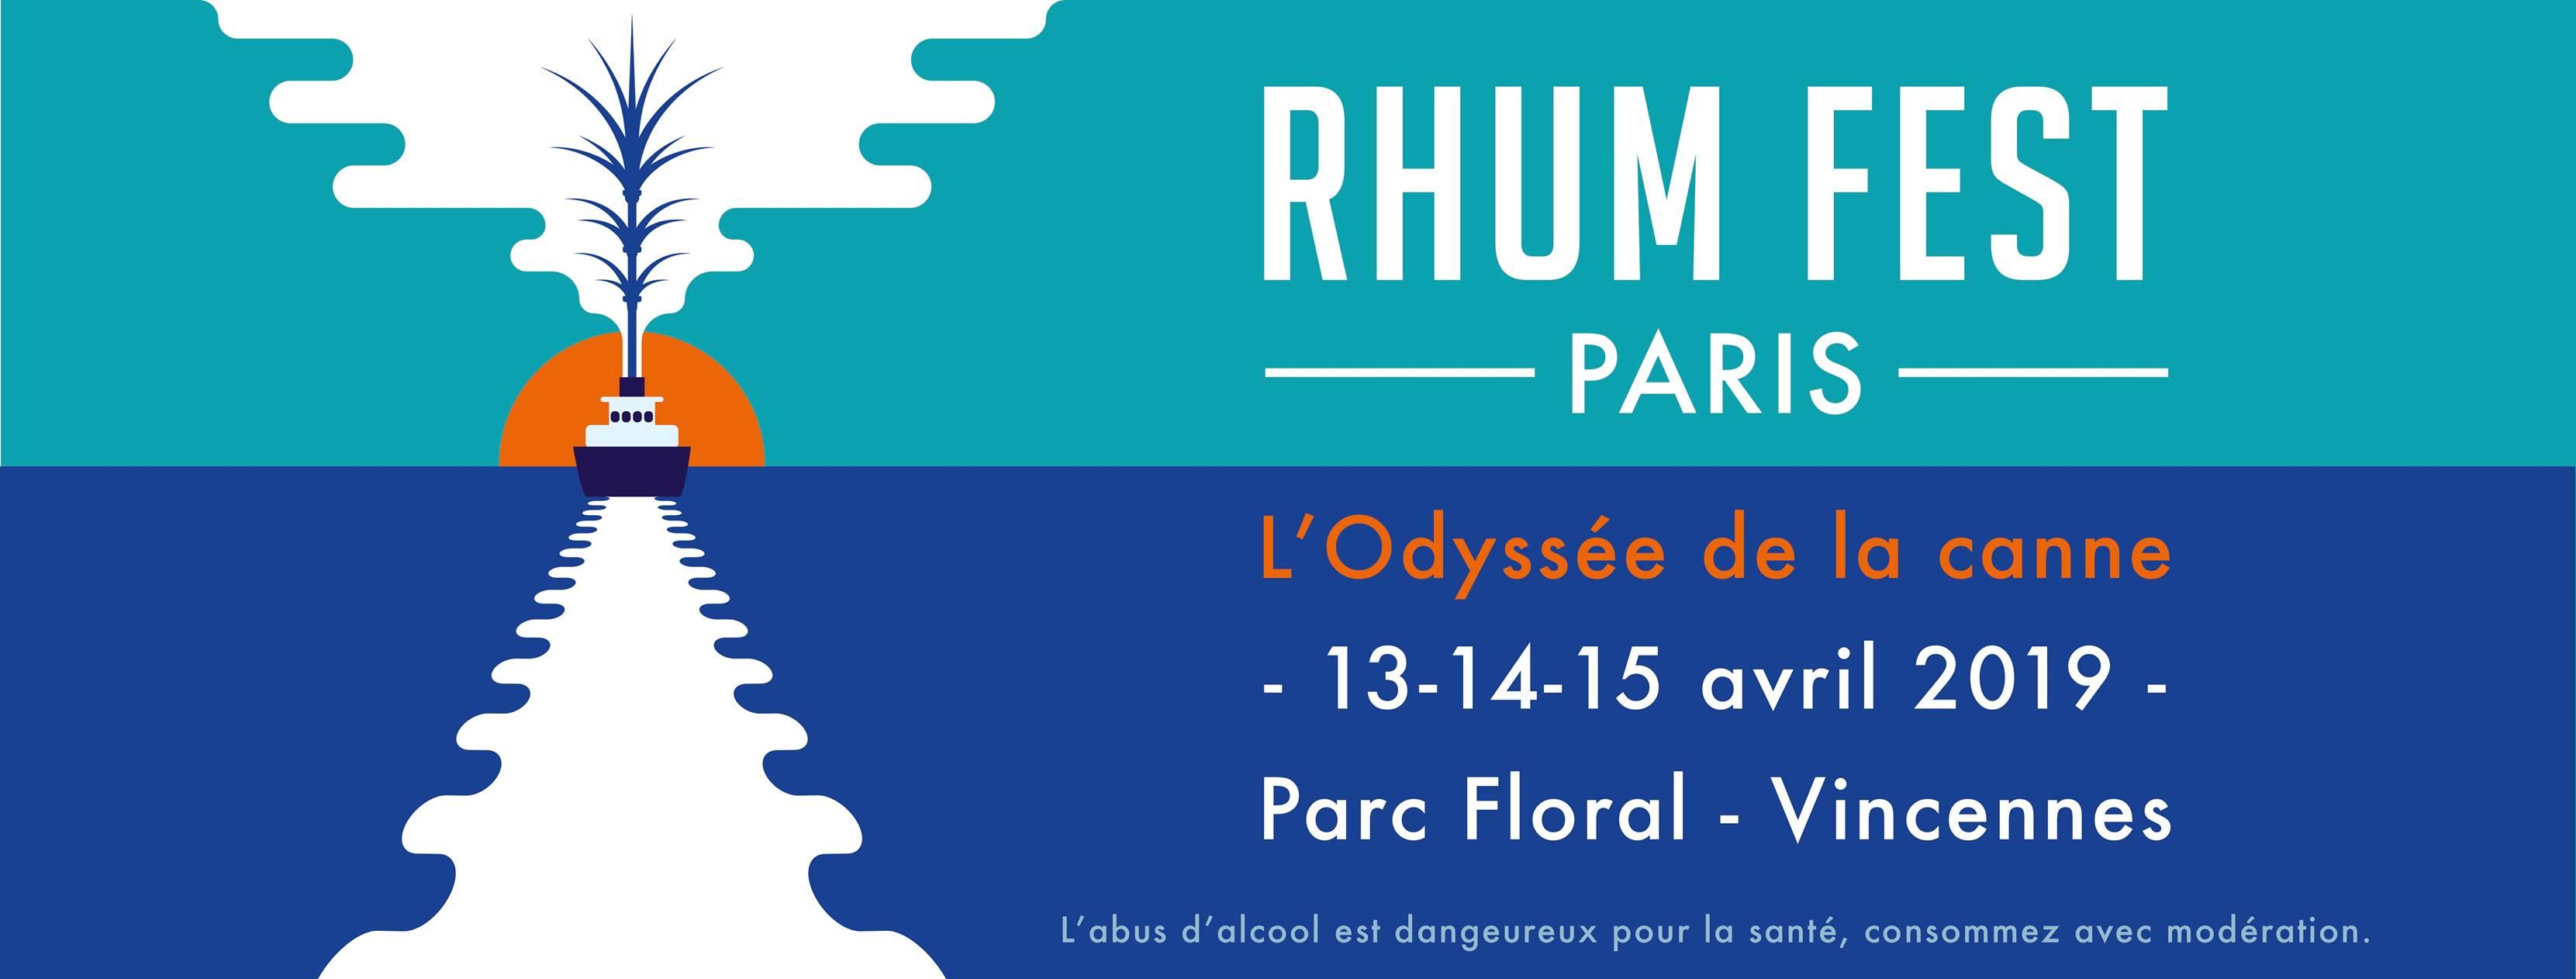 52 Martinis Paris Food & Drink Events April